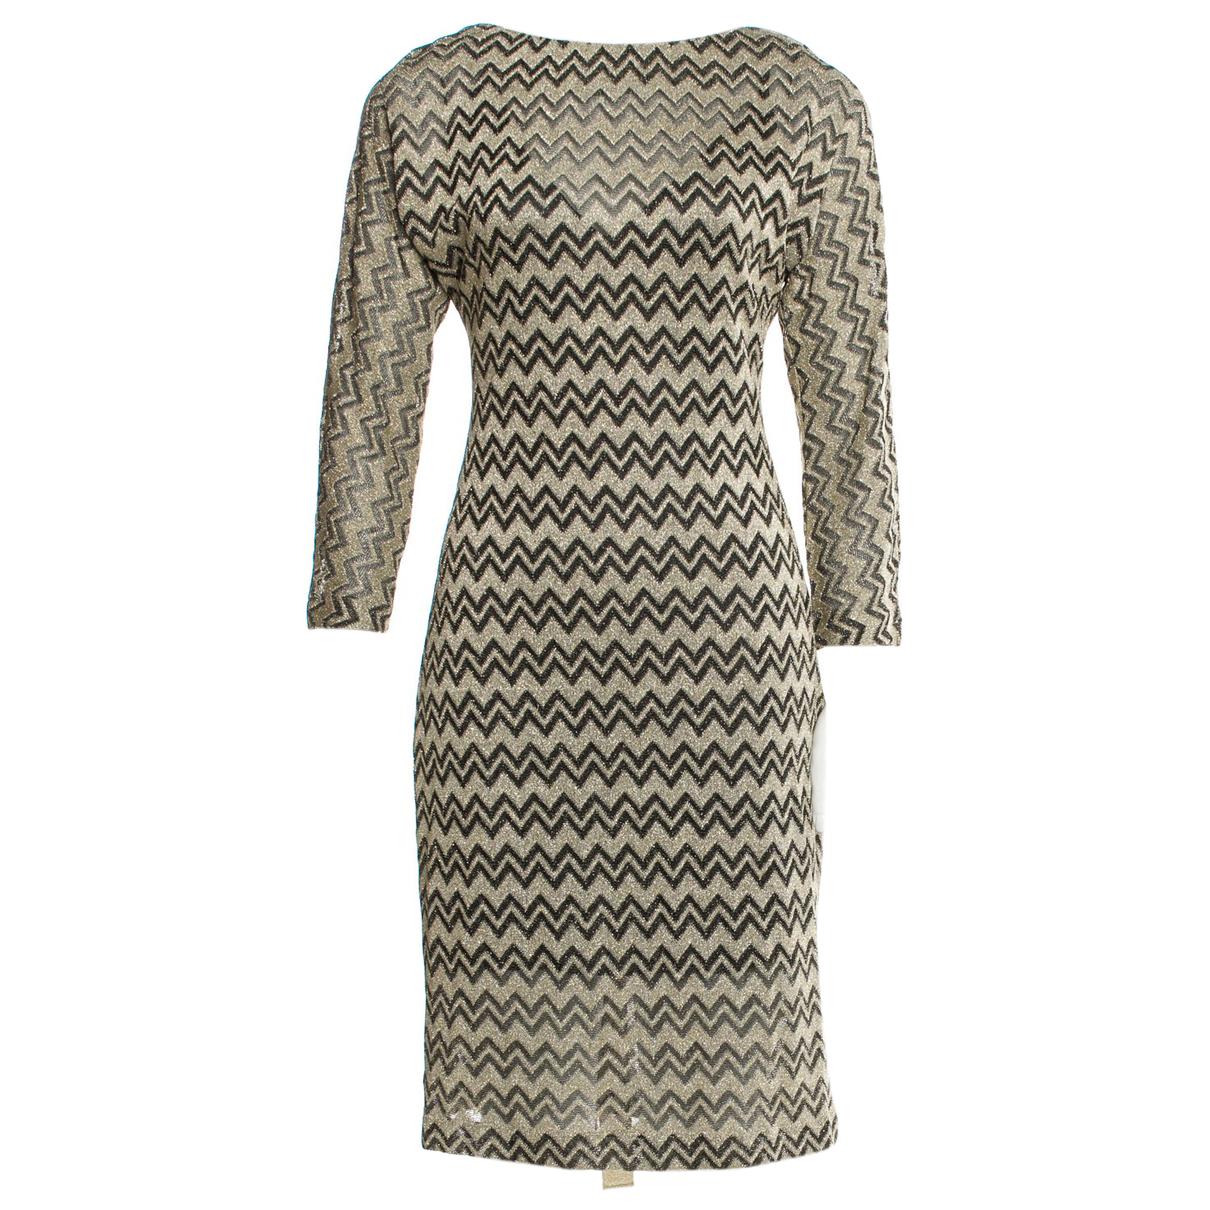 M Missoni N Gold dress for Women 44 IT